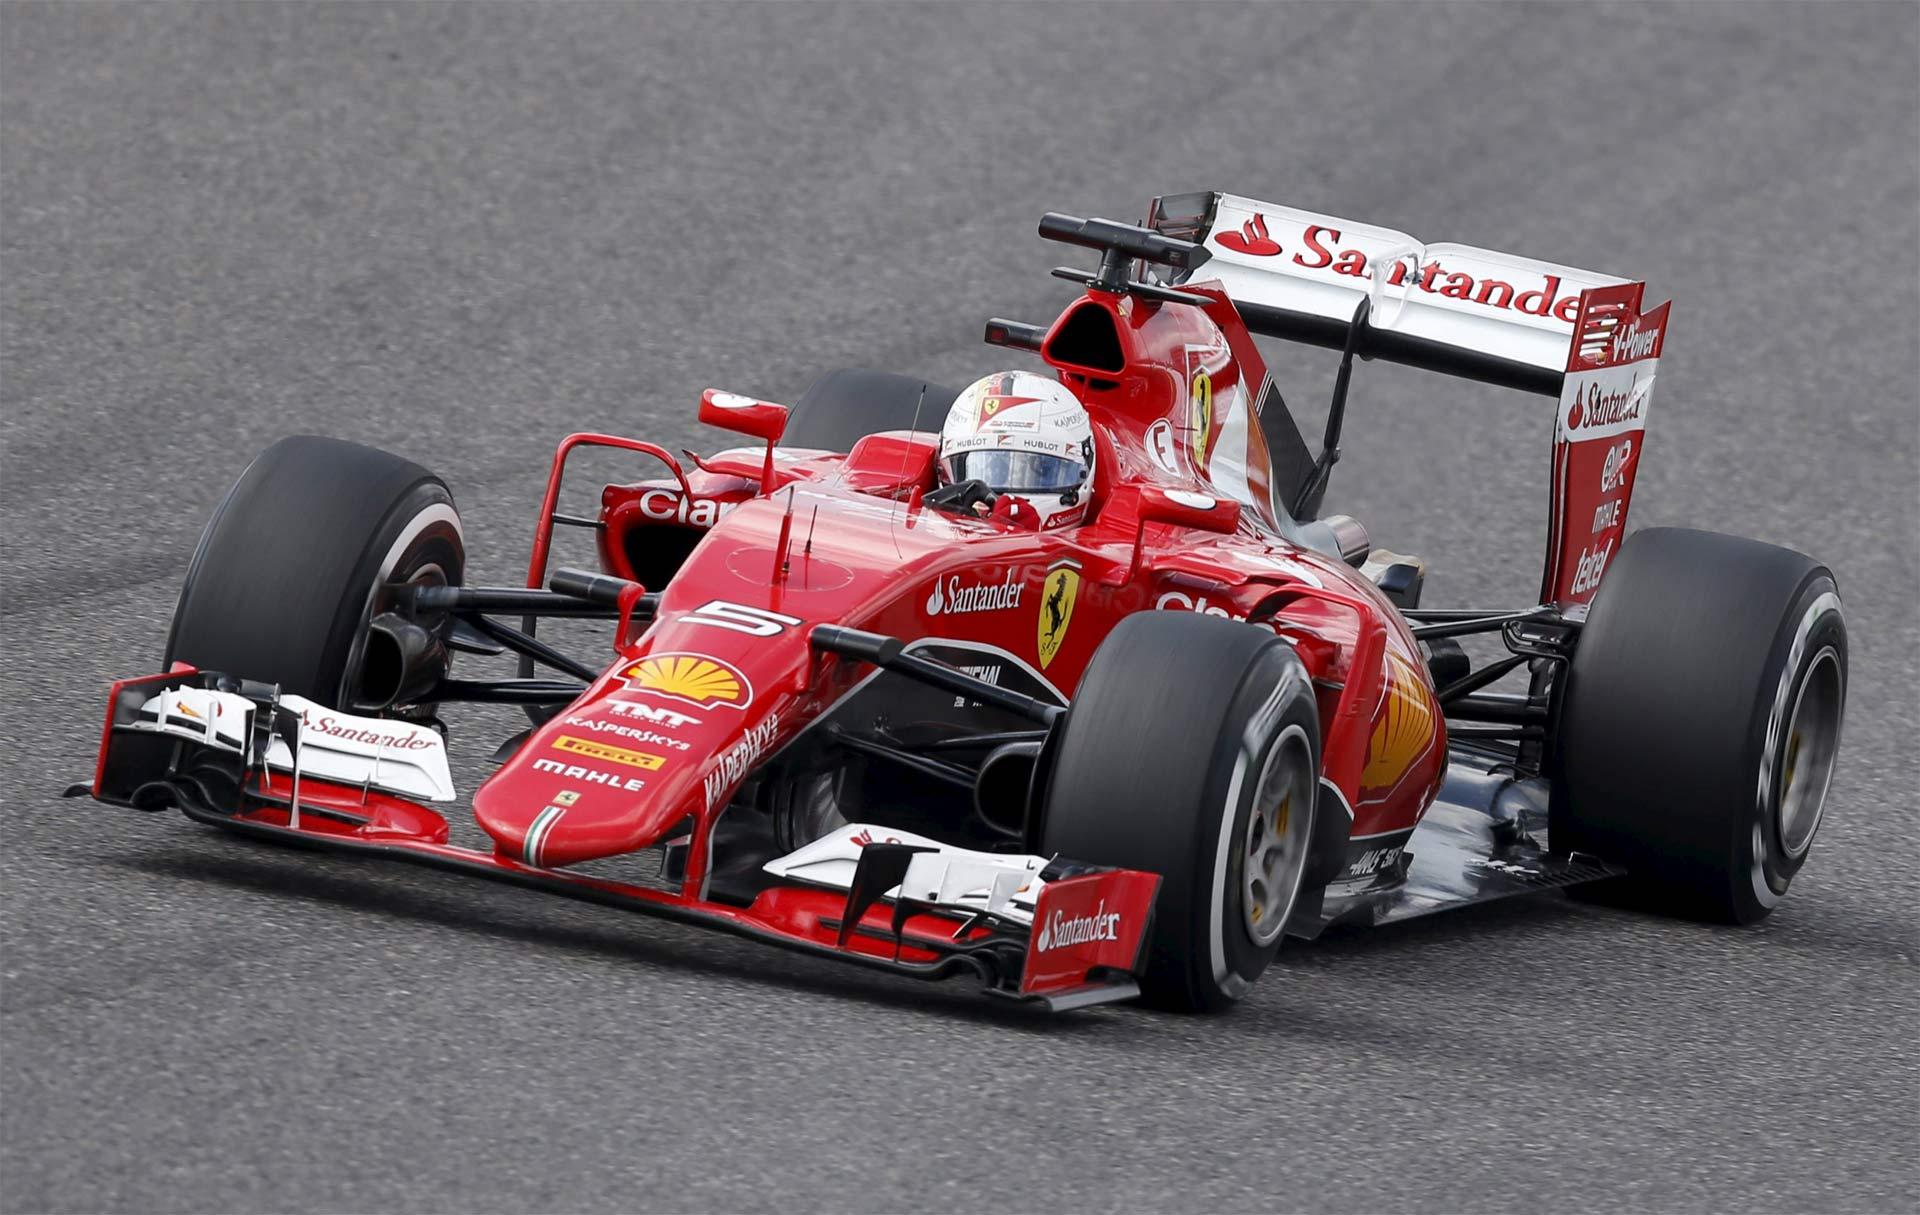 Sergio Marchionne sondea posibilidad de ofrecer servicios de motores a Red Bull